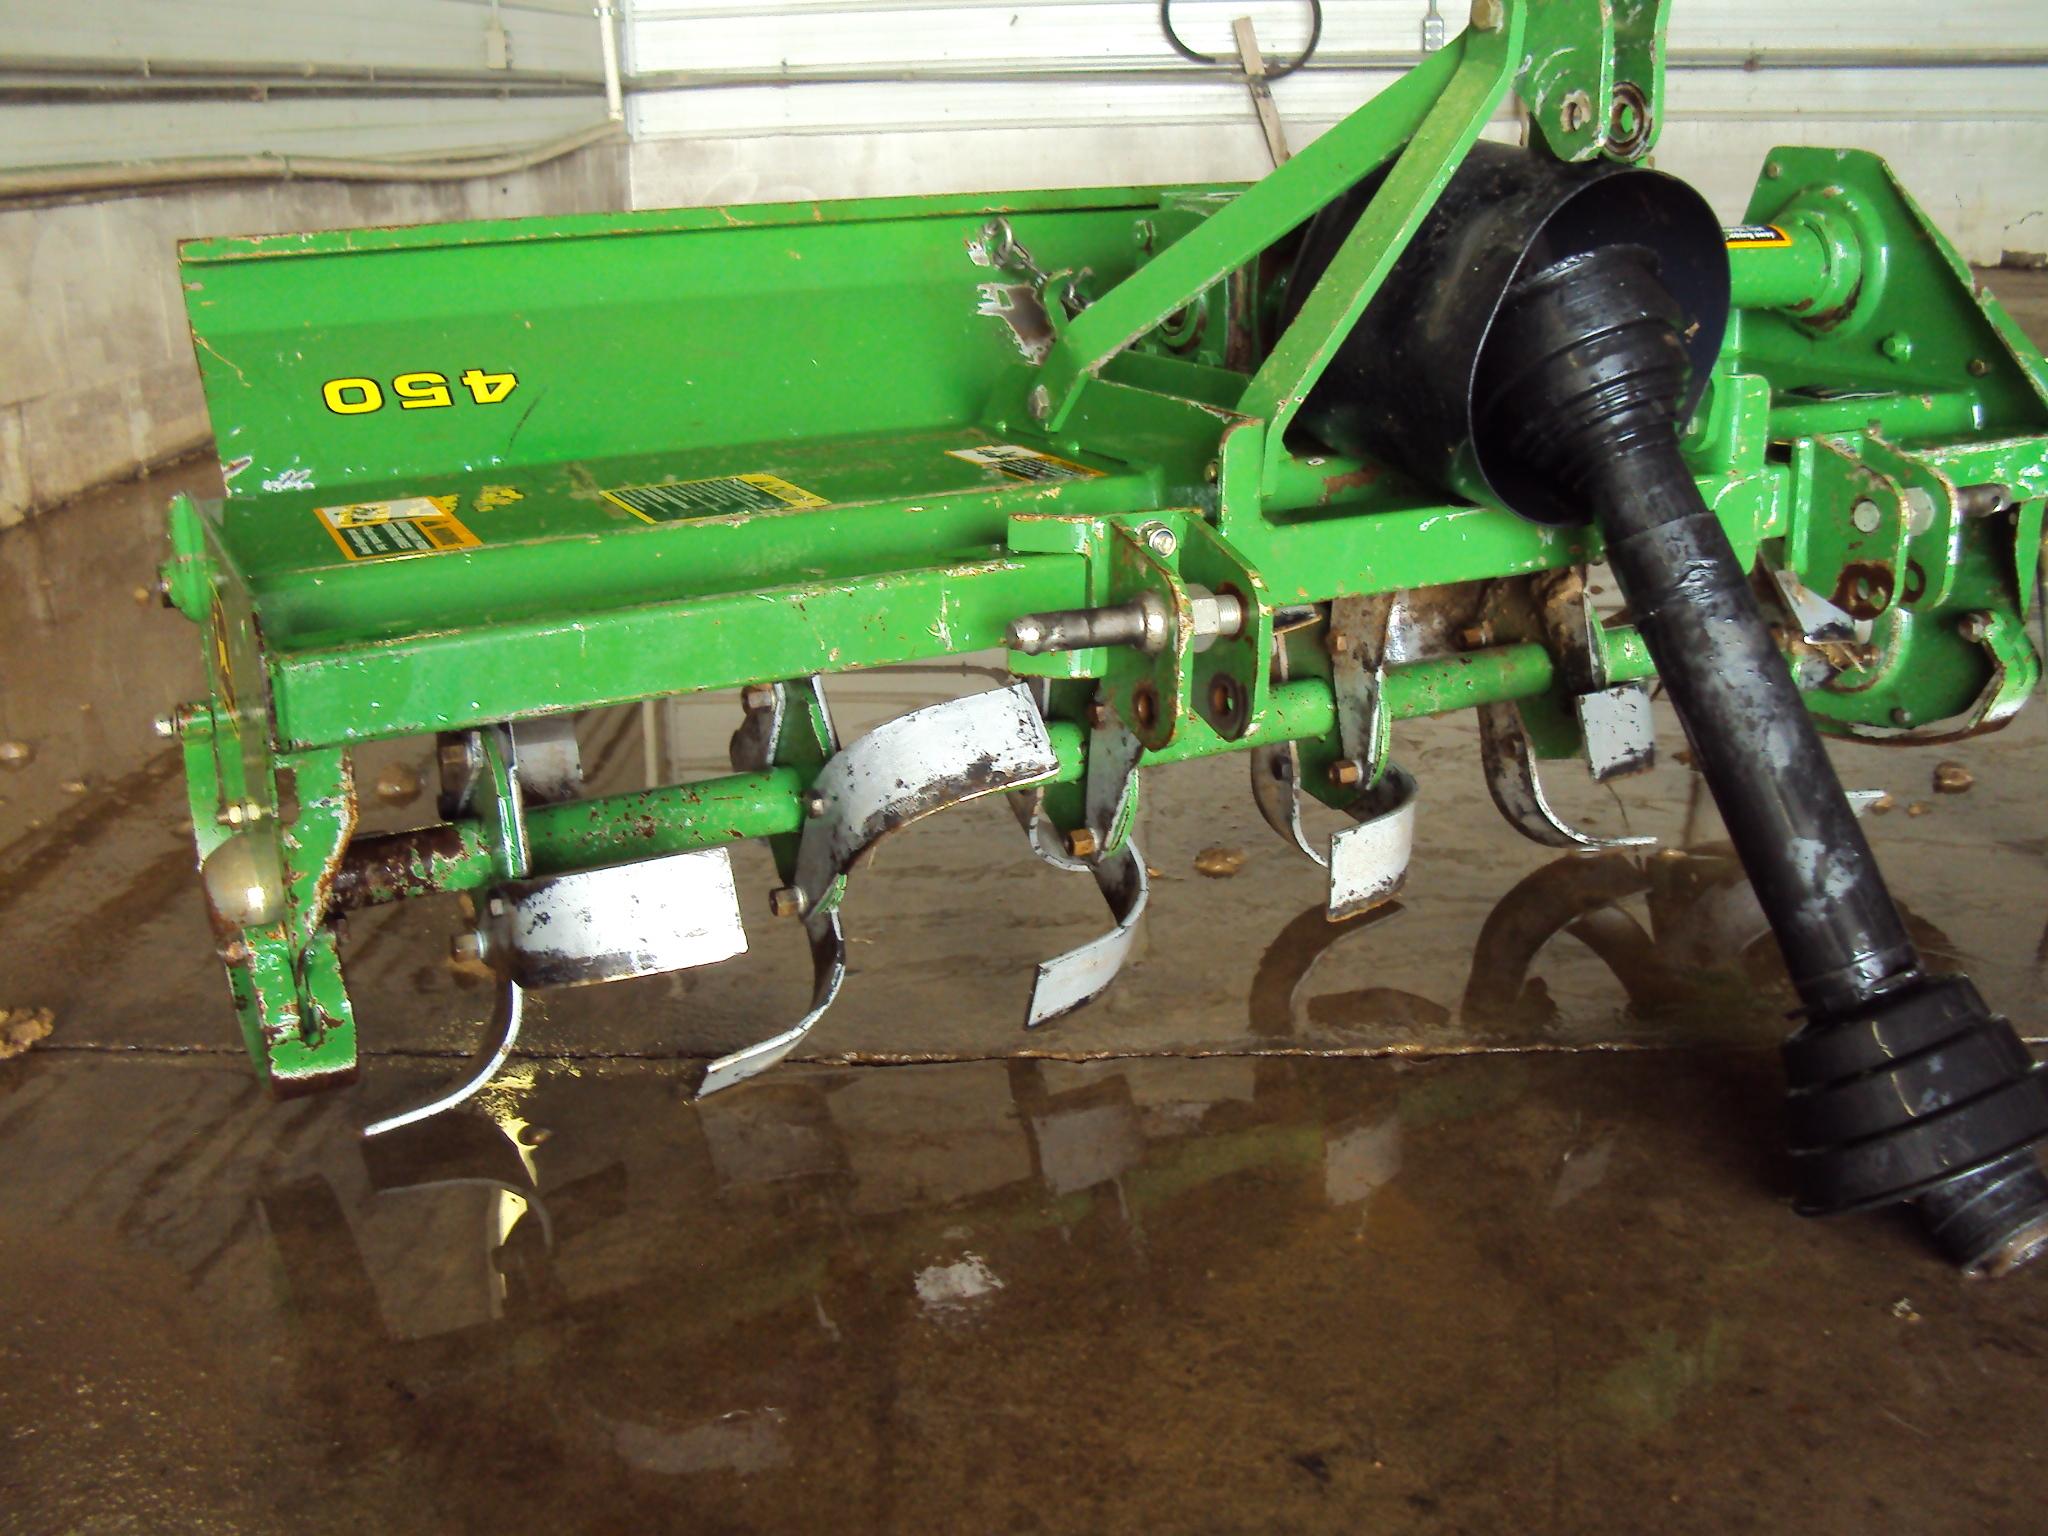 John Deere 450 Rototillers For Lawn Garden Tractors For Sale 48385